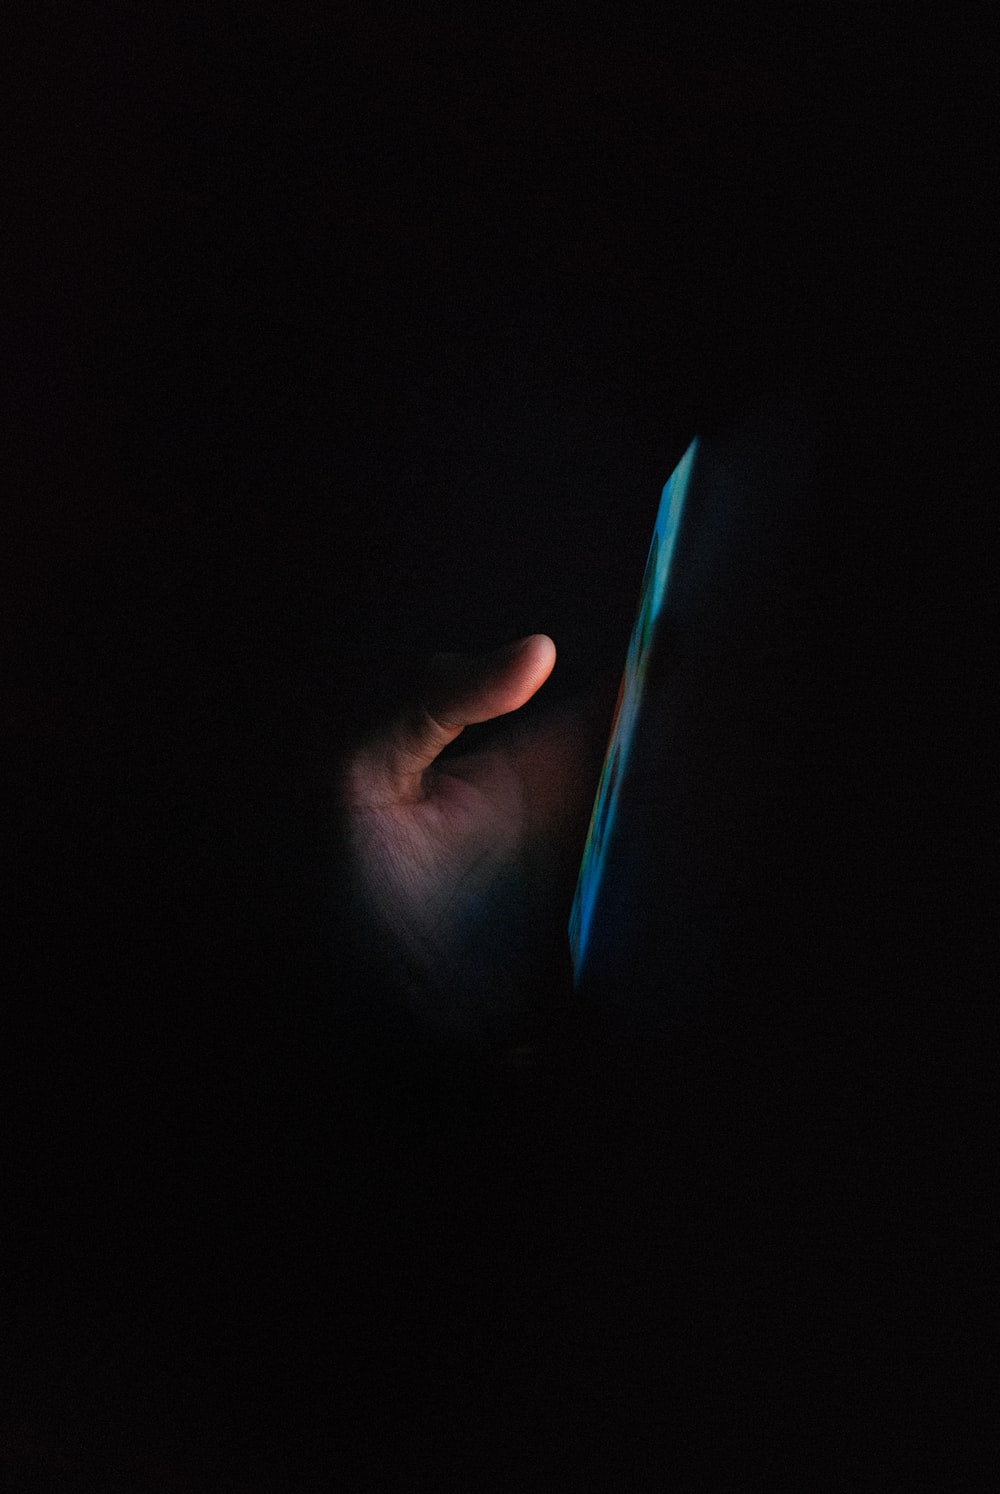 person holding blue light in dark room